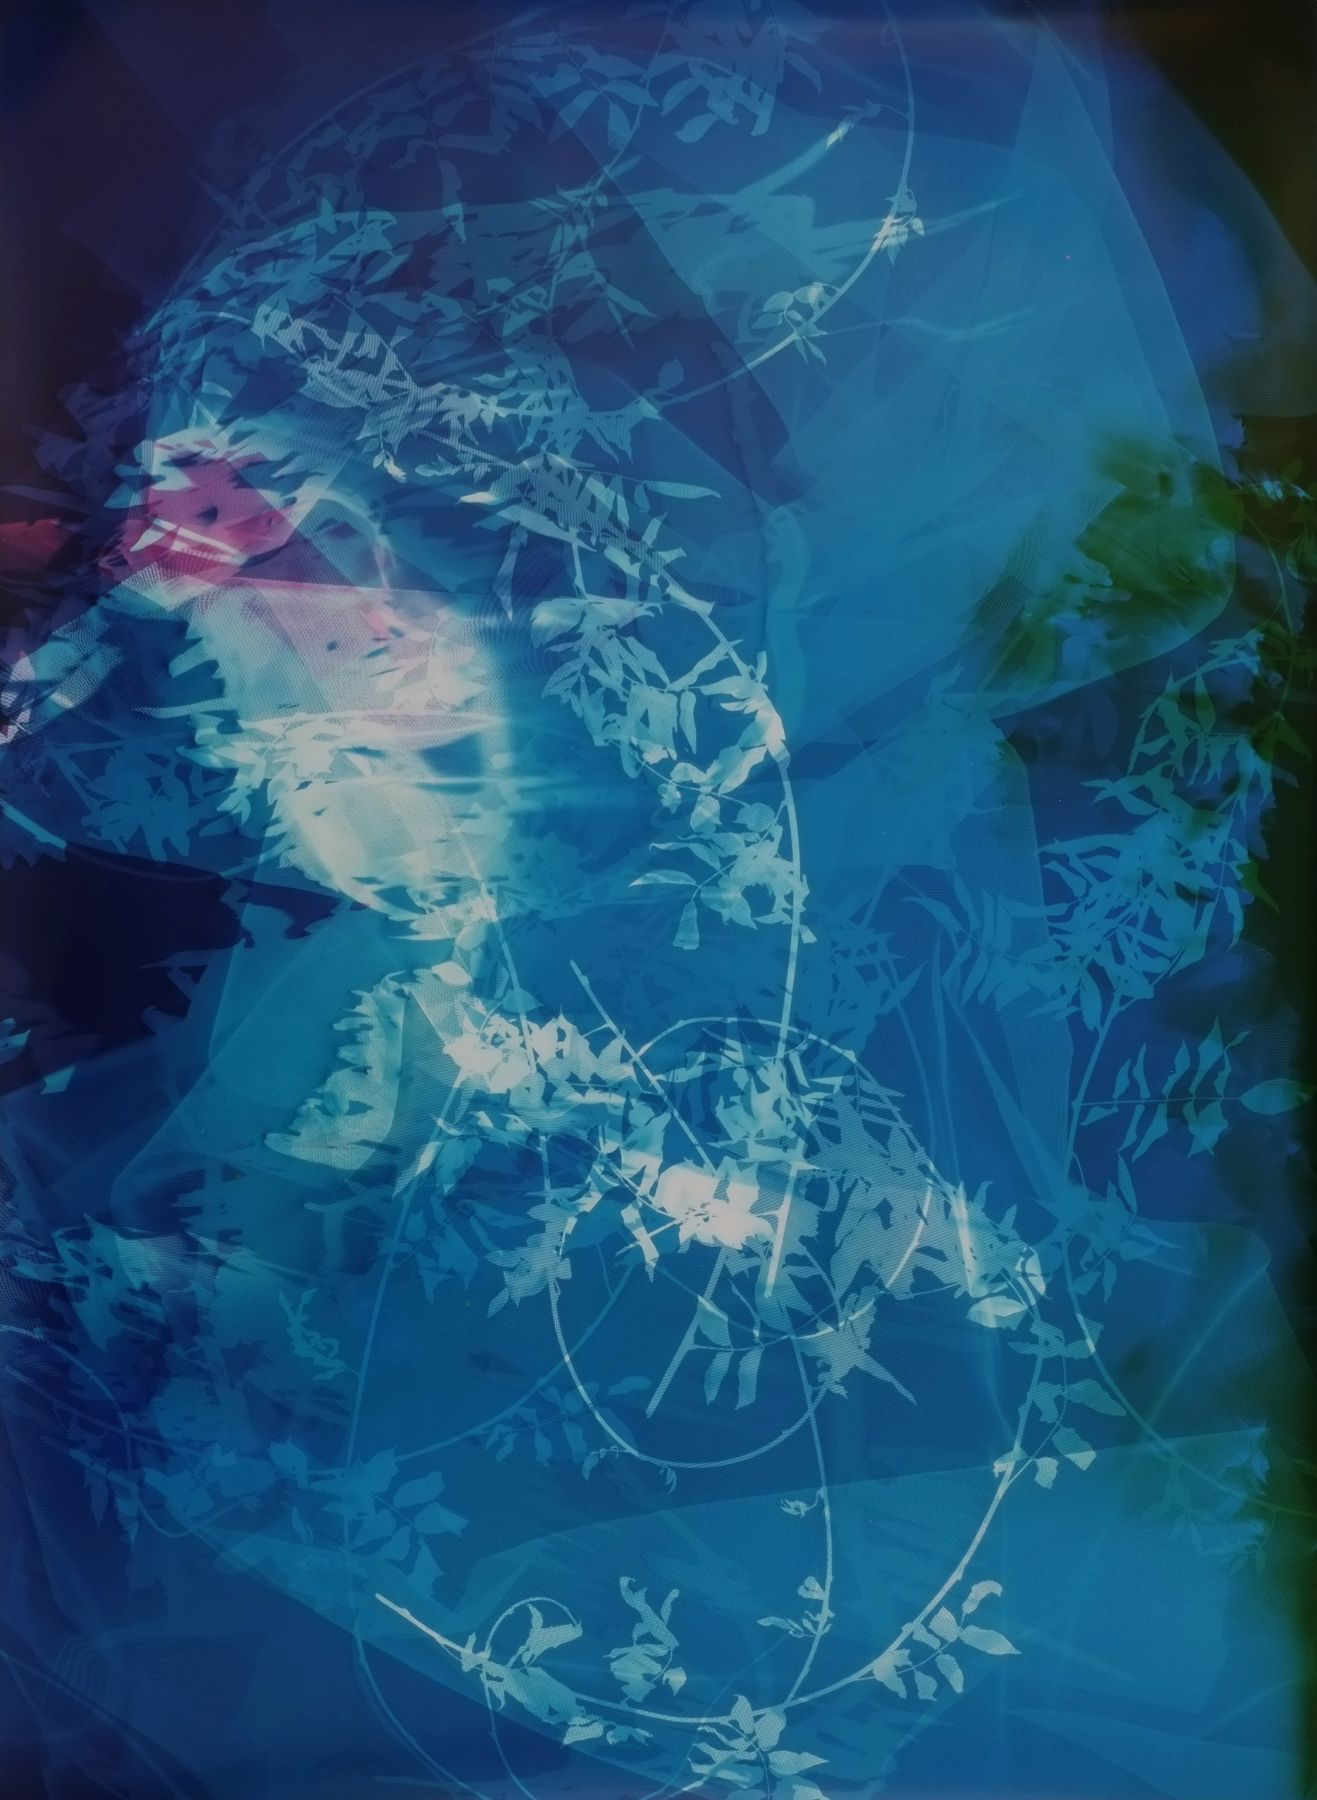 Field Recording (Sun Room II), 2016, 54 x 40 inchunique chromogenic print